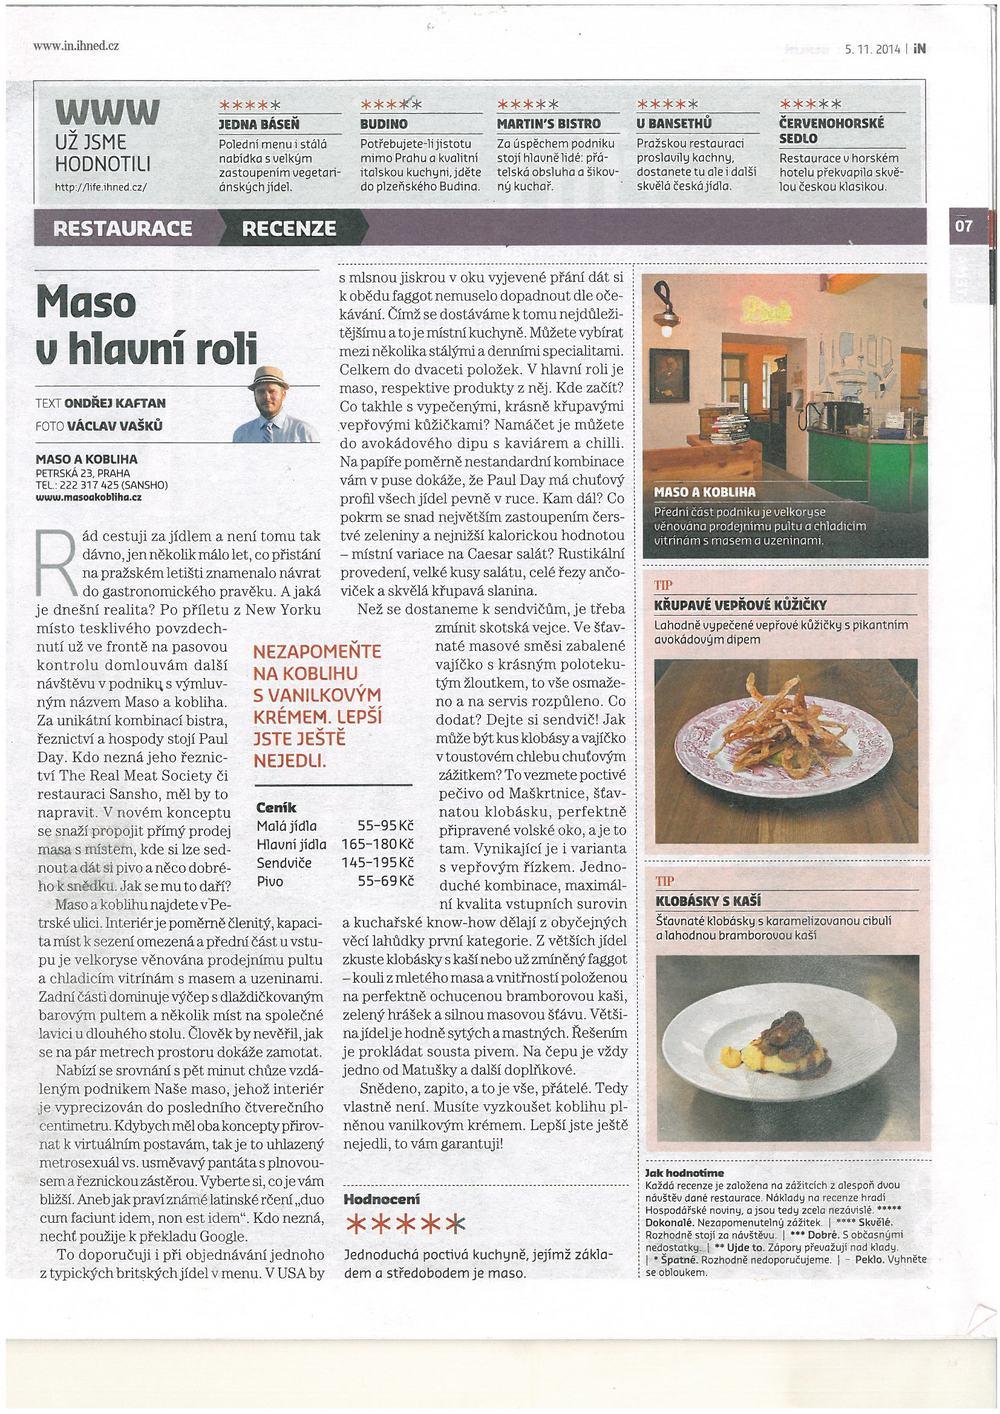 Maso v hlavní roli, IN magazín HN, 2014.jpg